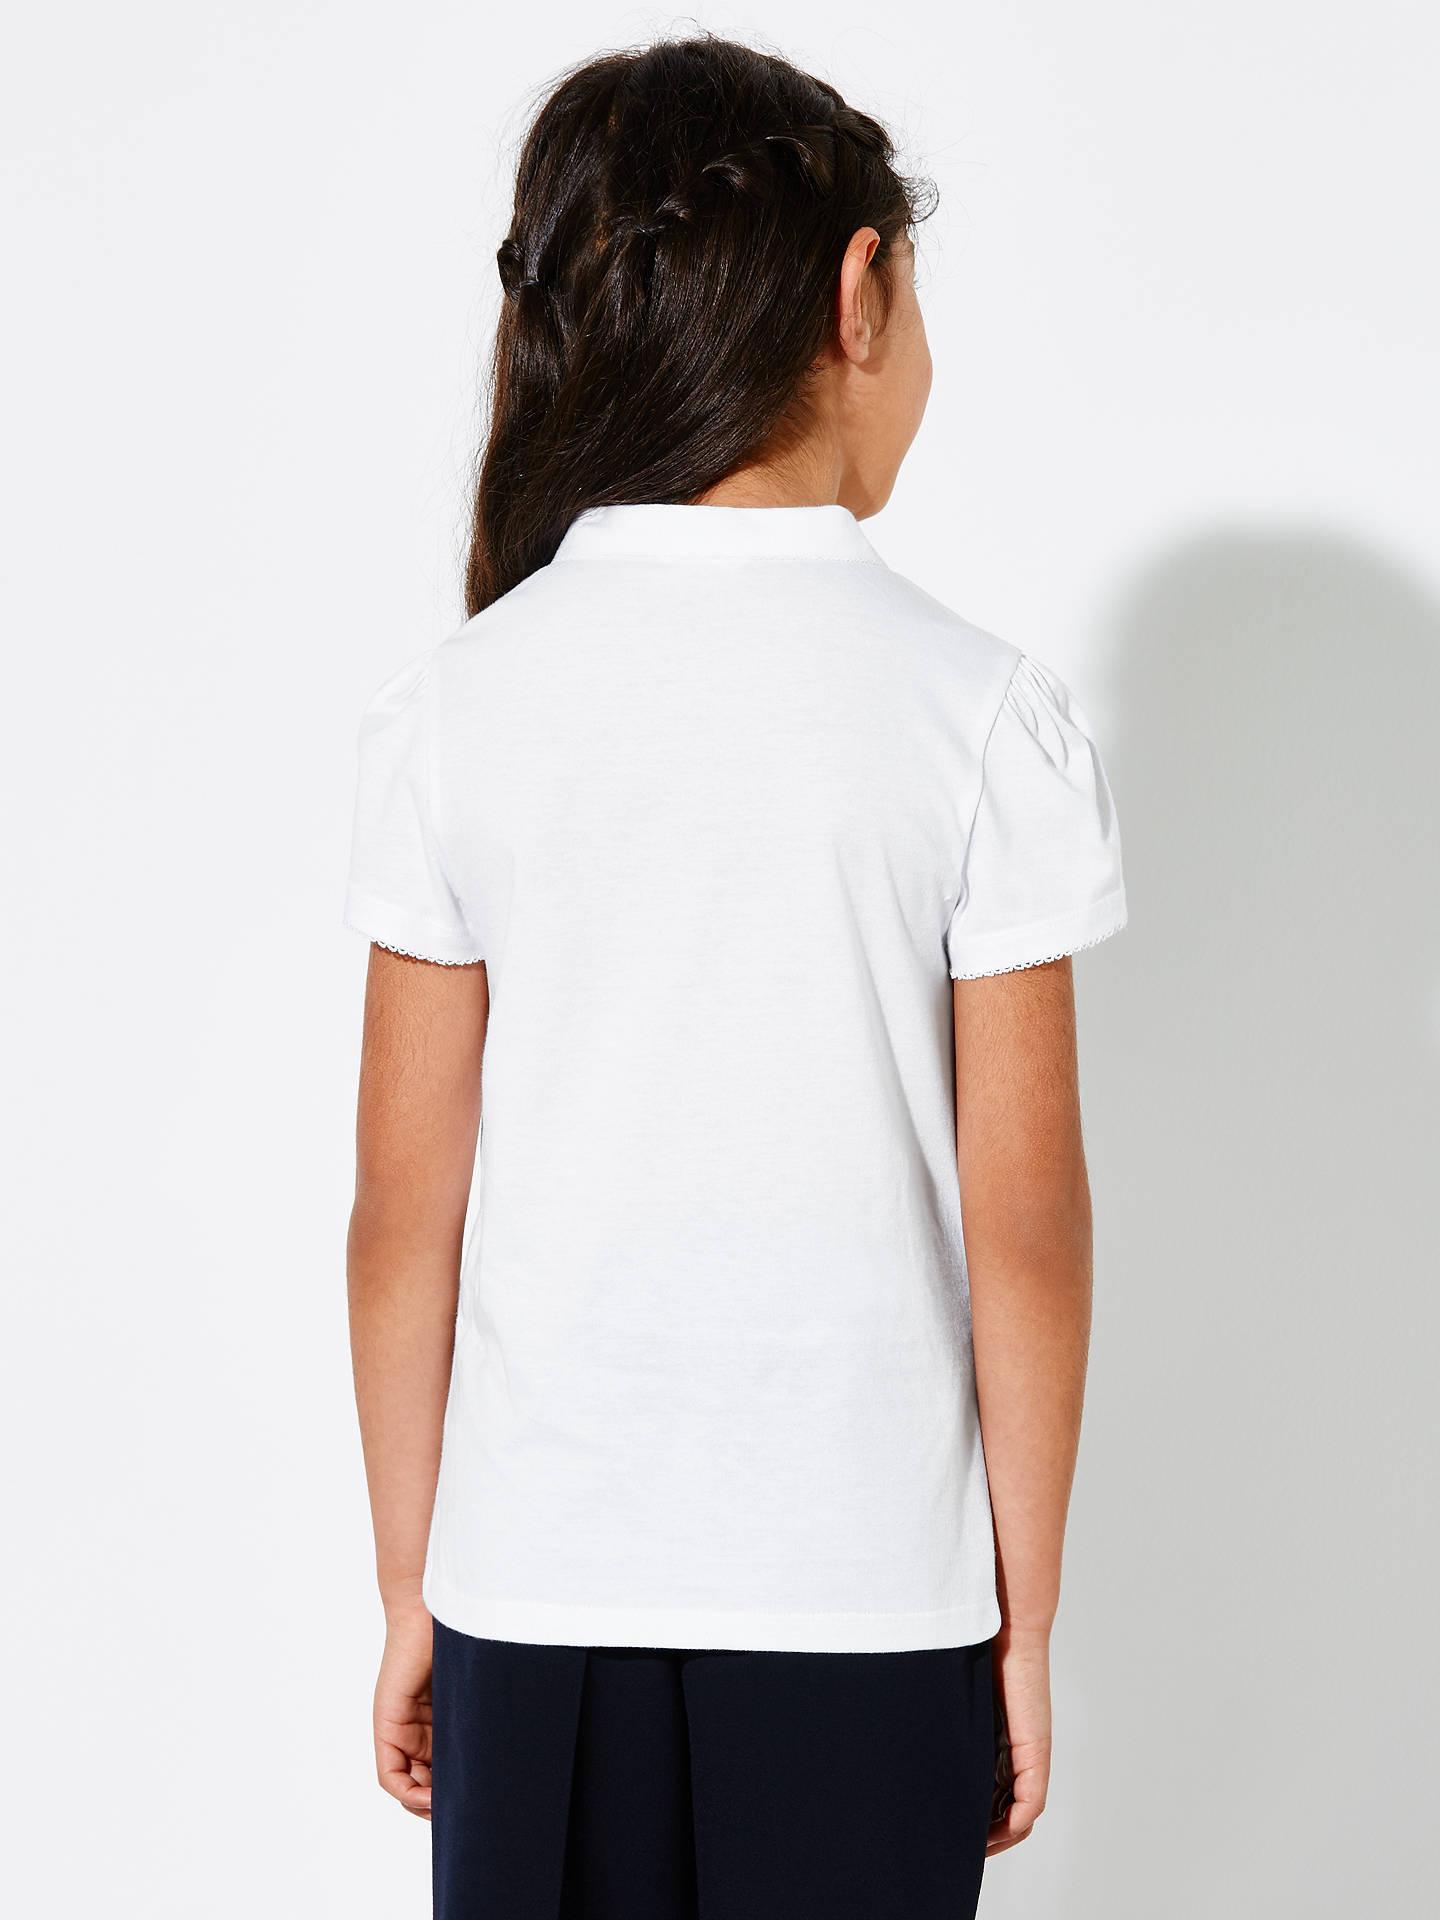 6bc55ea4 ... Buy John Lewis & Partners Girls' Cotton Picot Trim Collar School Polo  Shirt, White ...